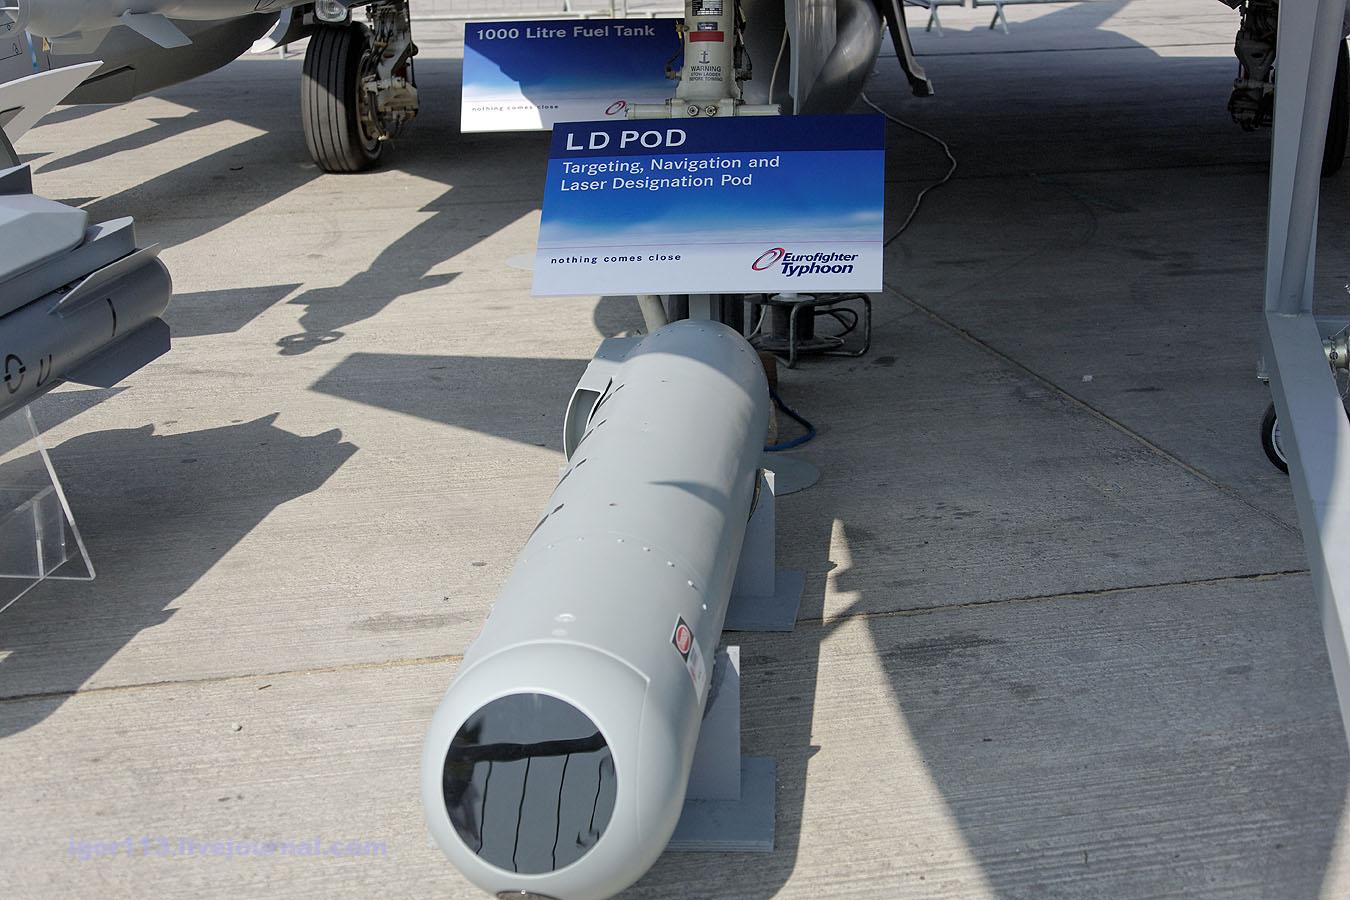 схема подвески бомб 25 р, рб